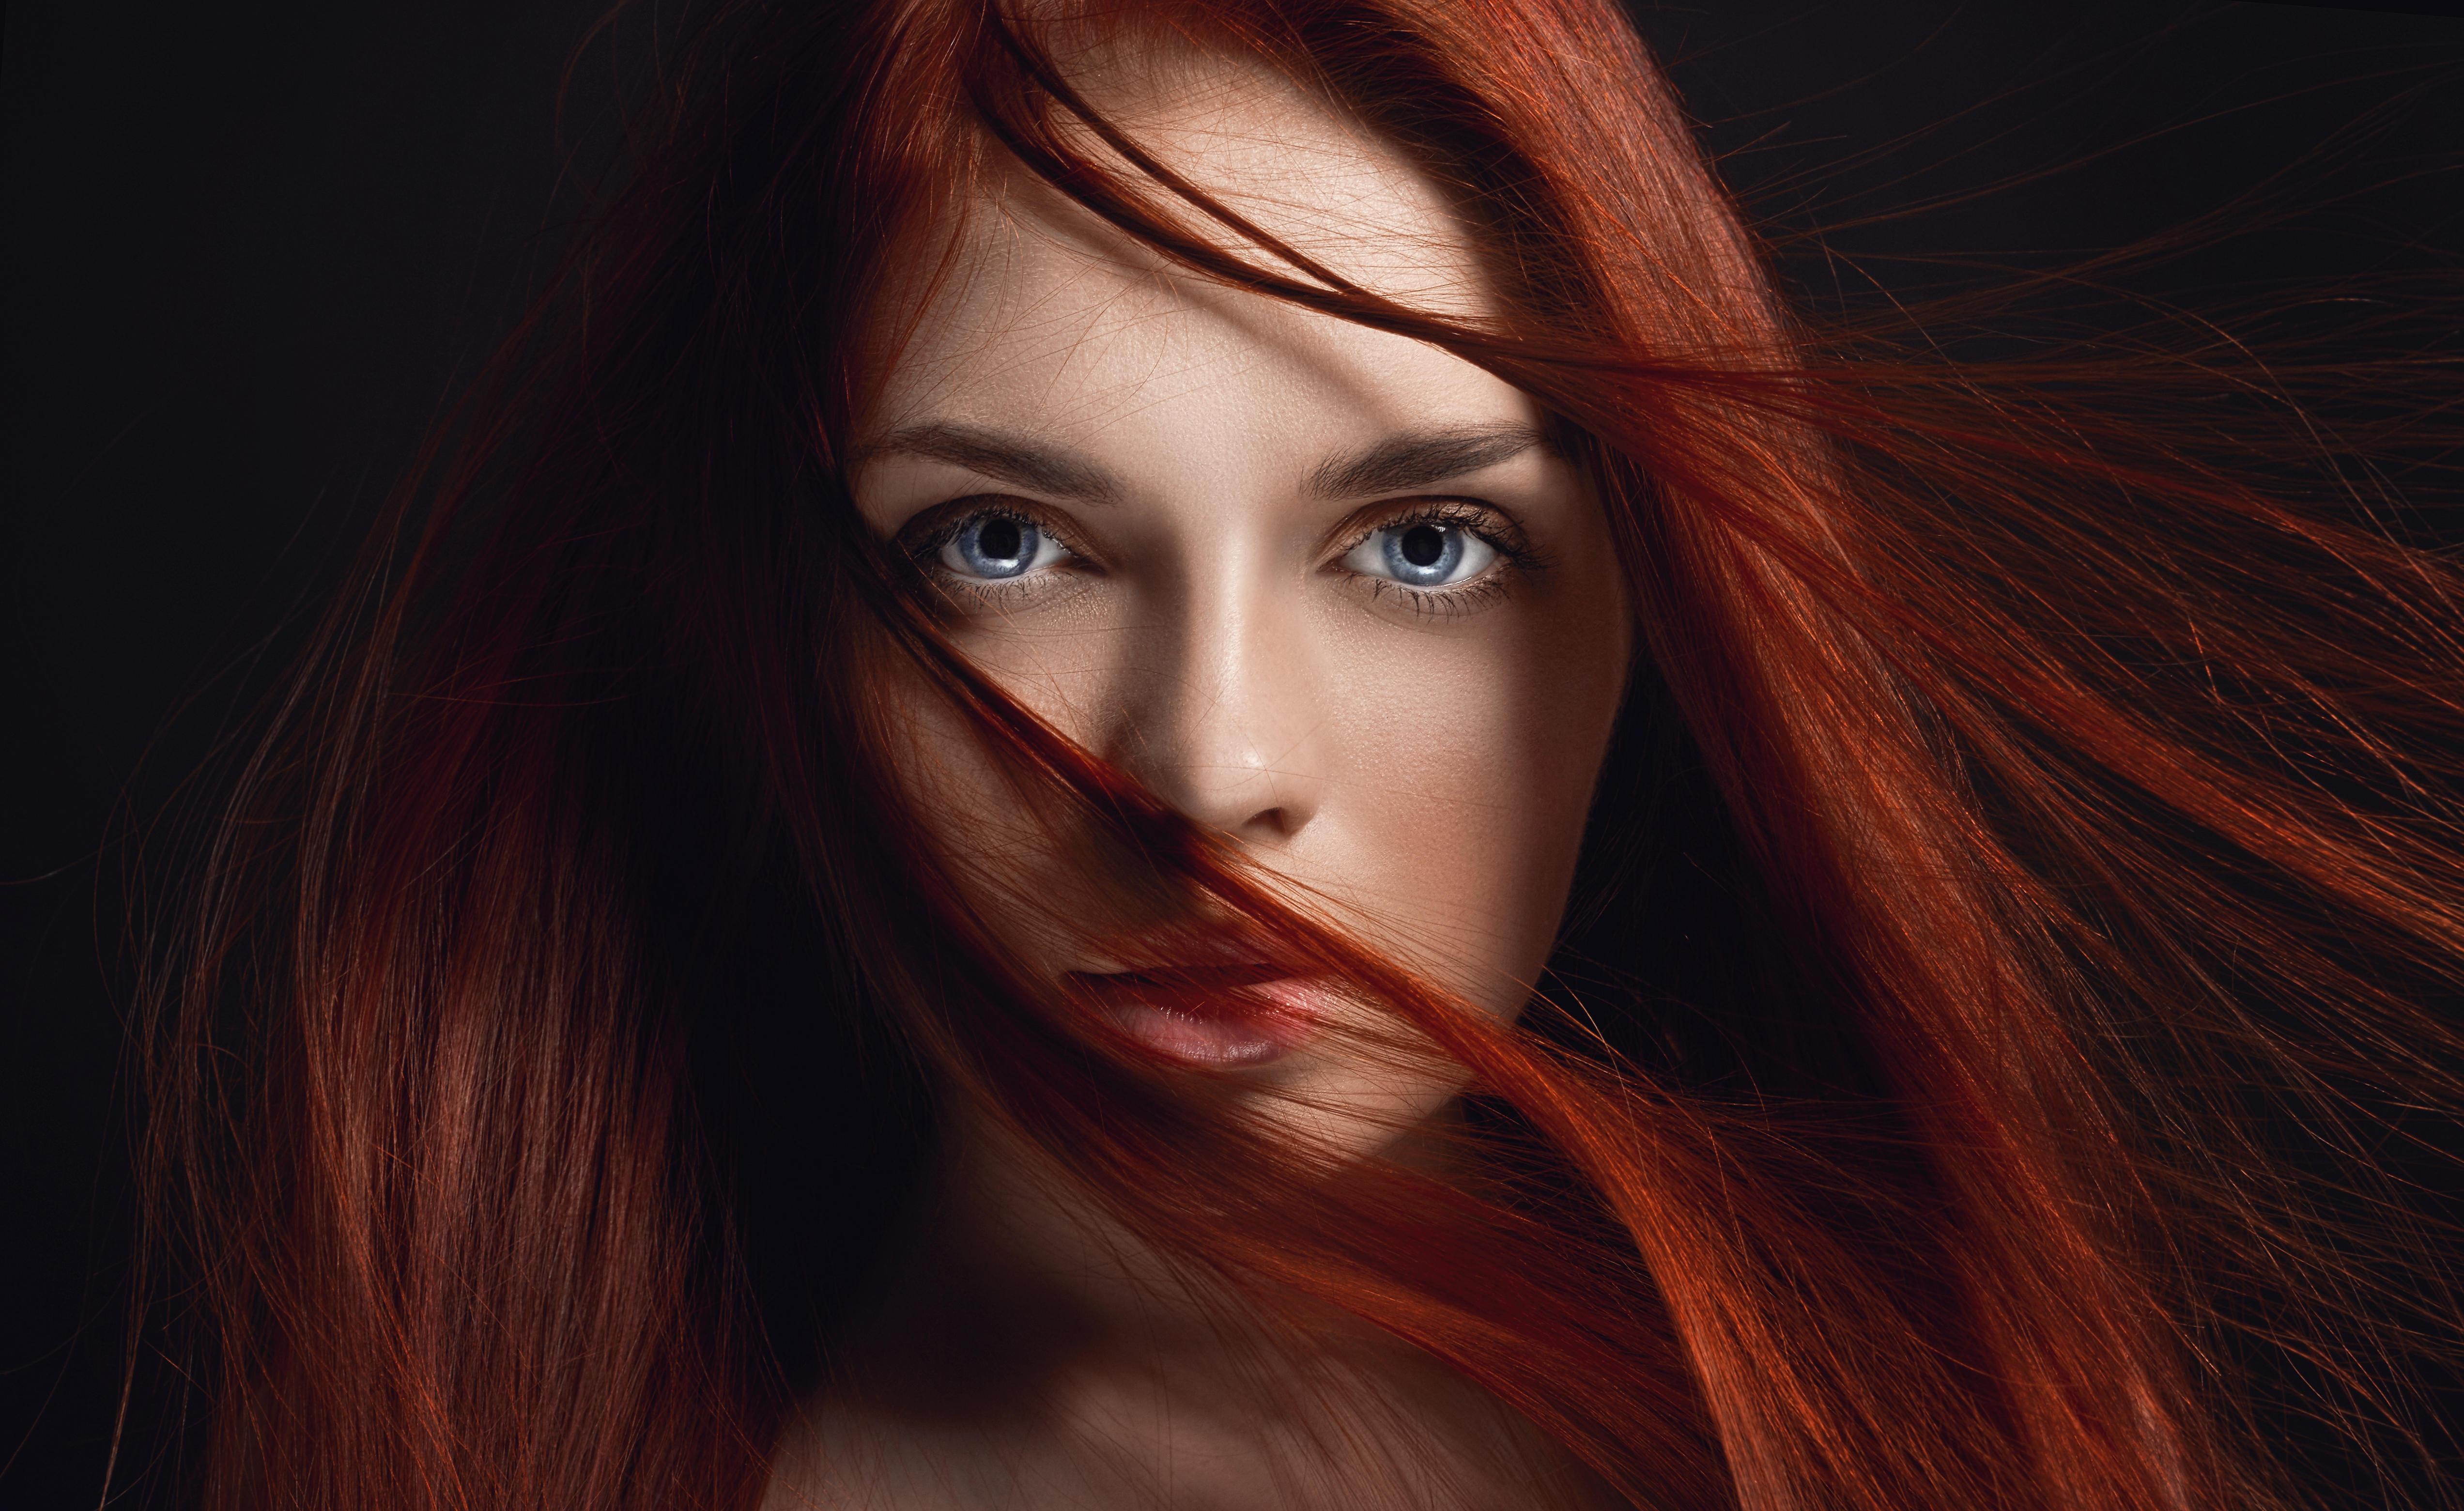 Redhead Girl Hairs On Face 4K 5K, Hd Girls, 4K Wallpapers -8506